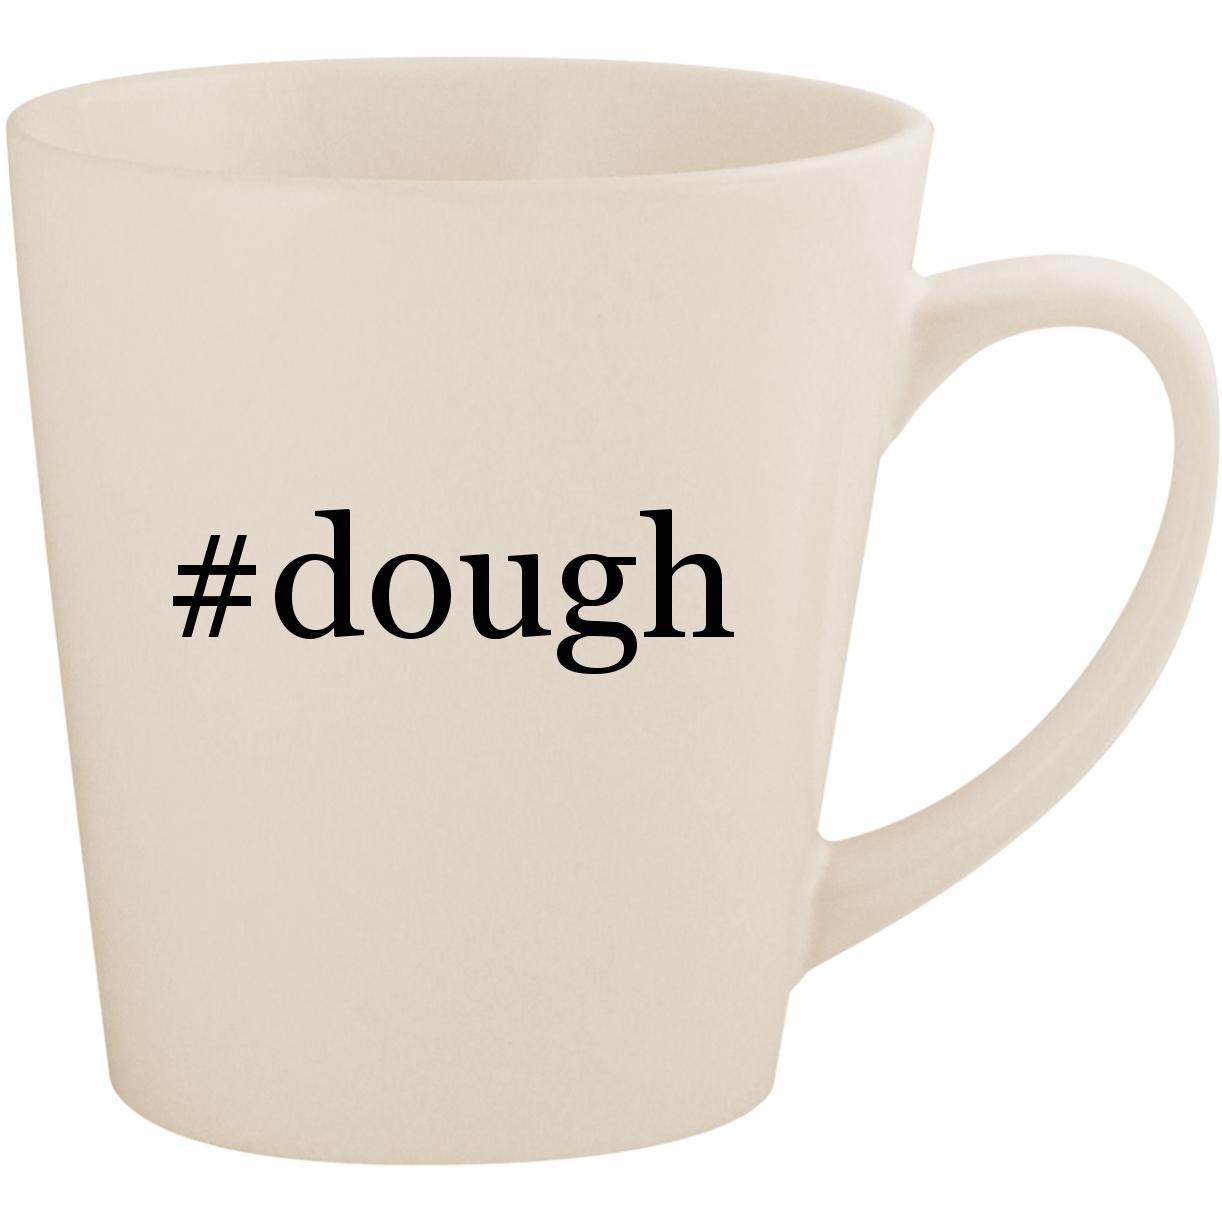 #dough - White Hashtag 12oz Ceramic Latte Mug Cup